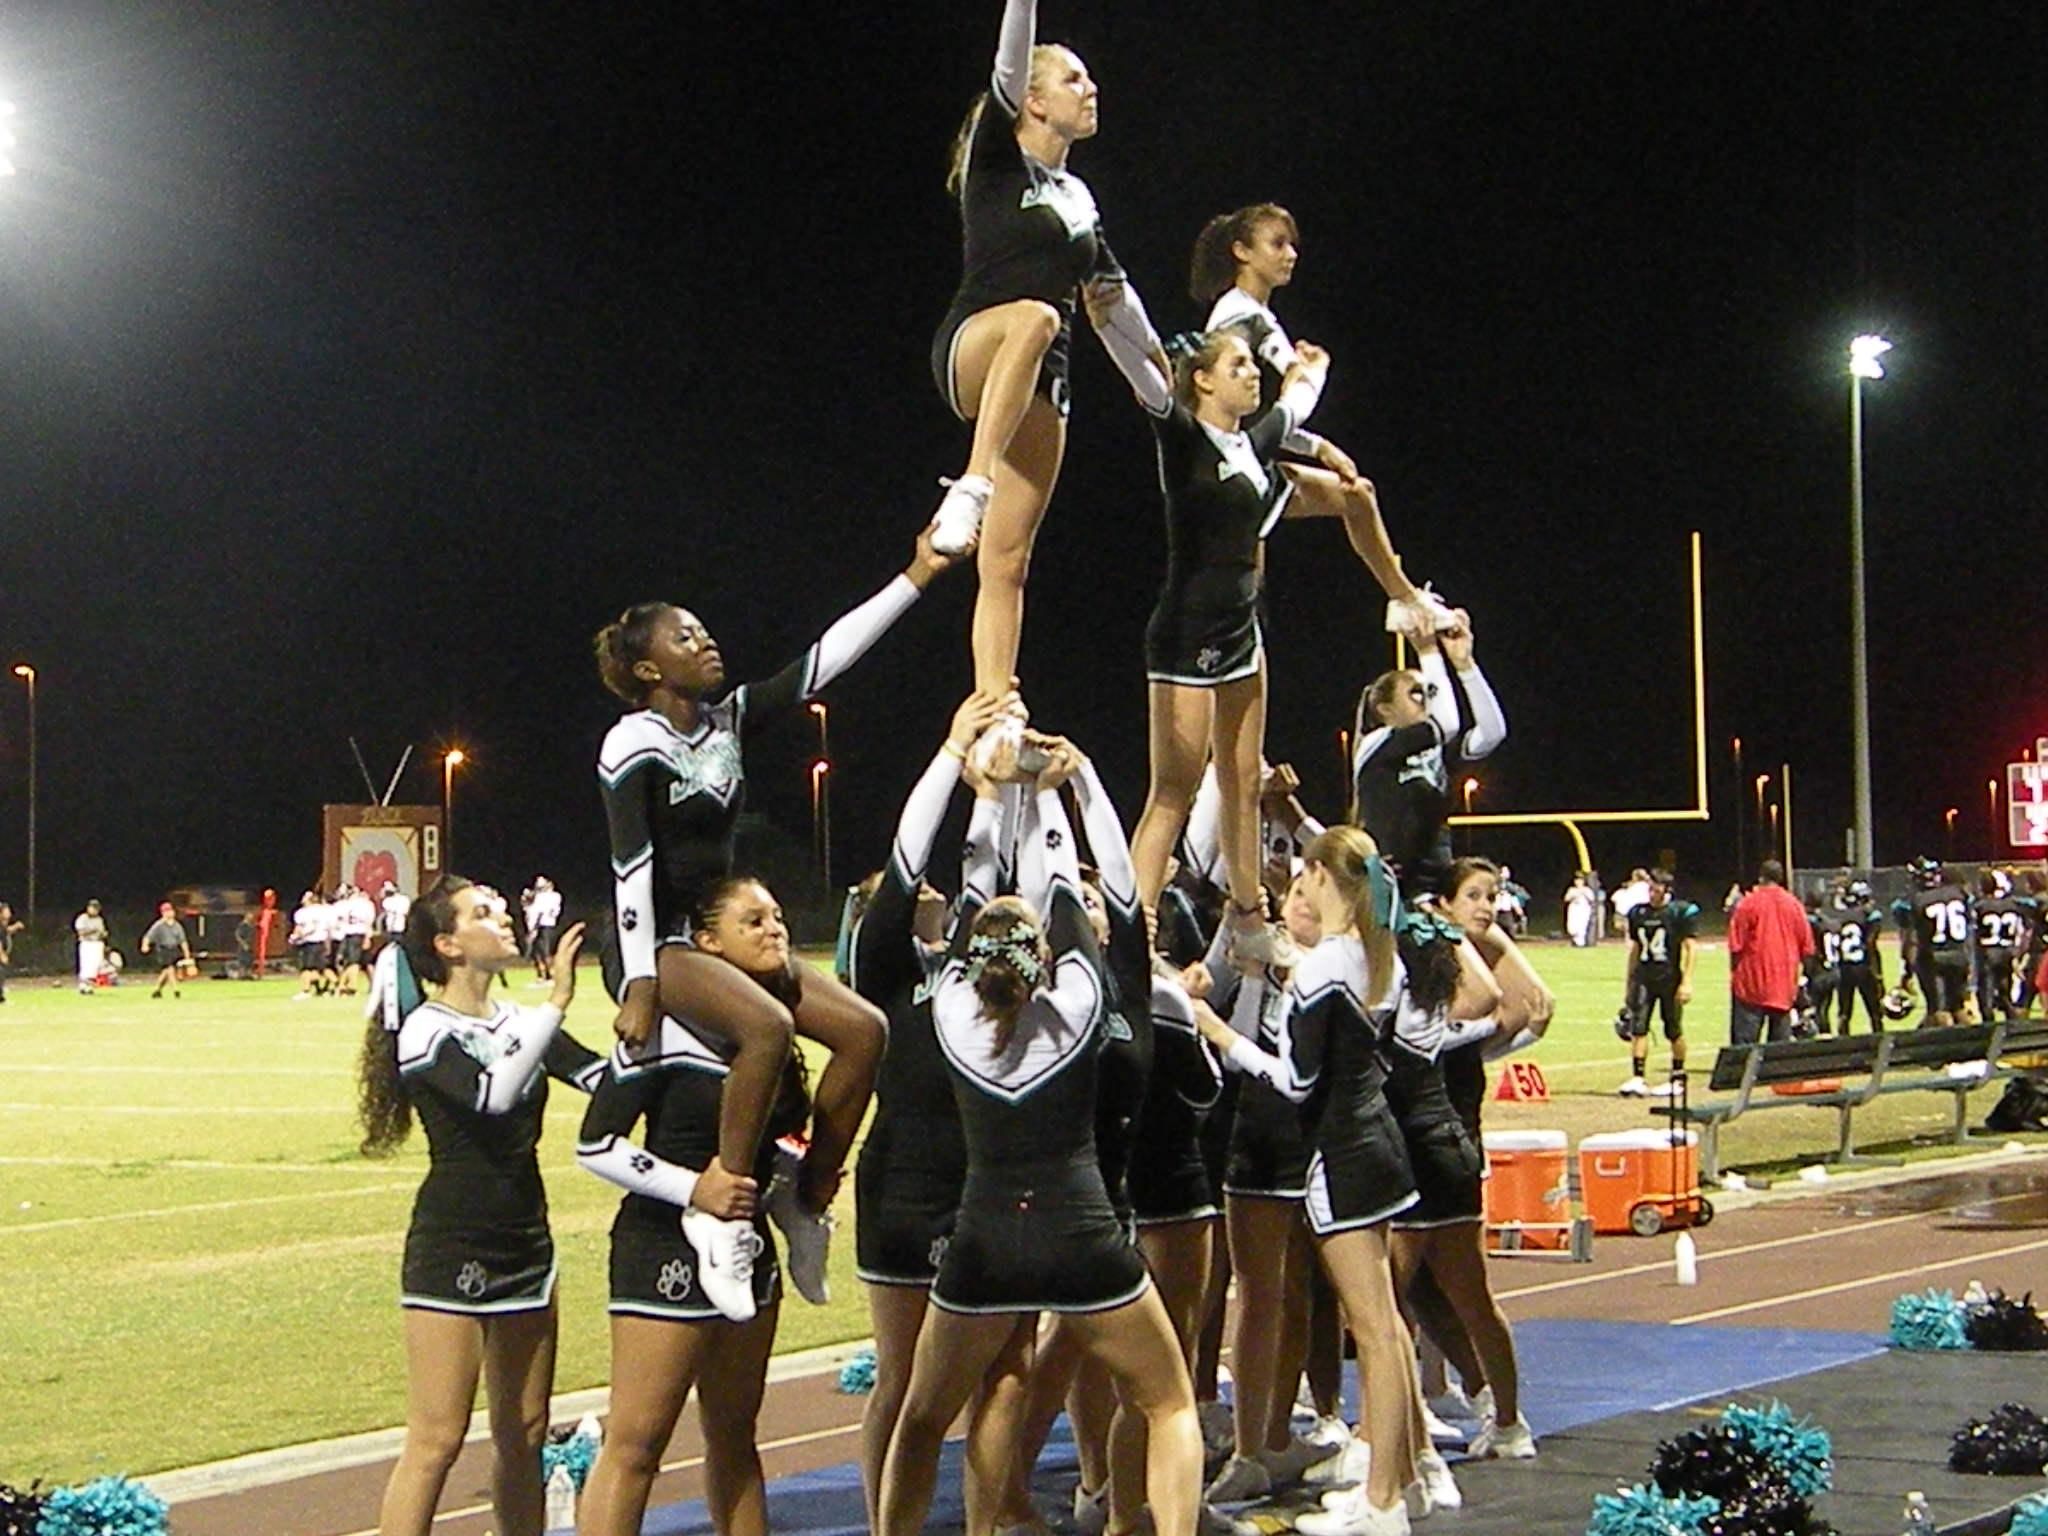 Pictures high school cheerleading stunts Pictures of Cheer Stunts LoveToKnow